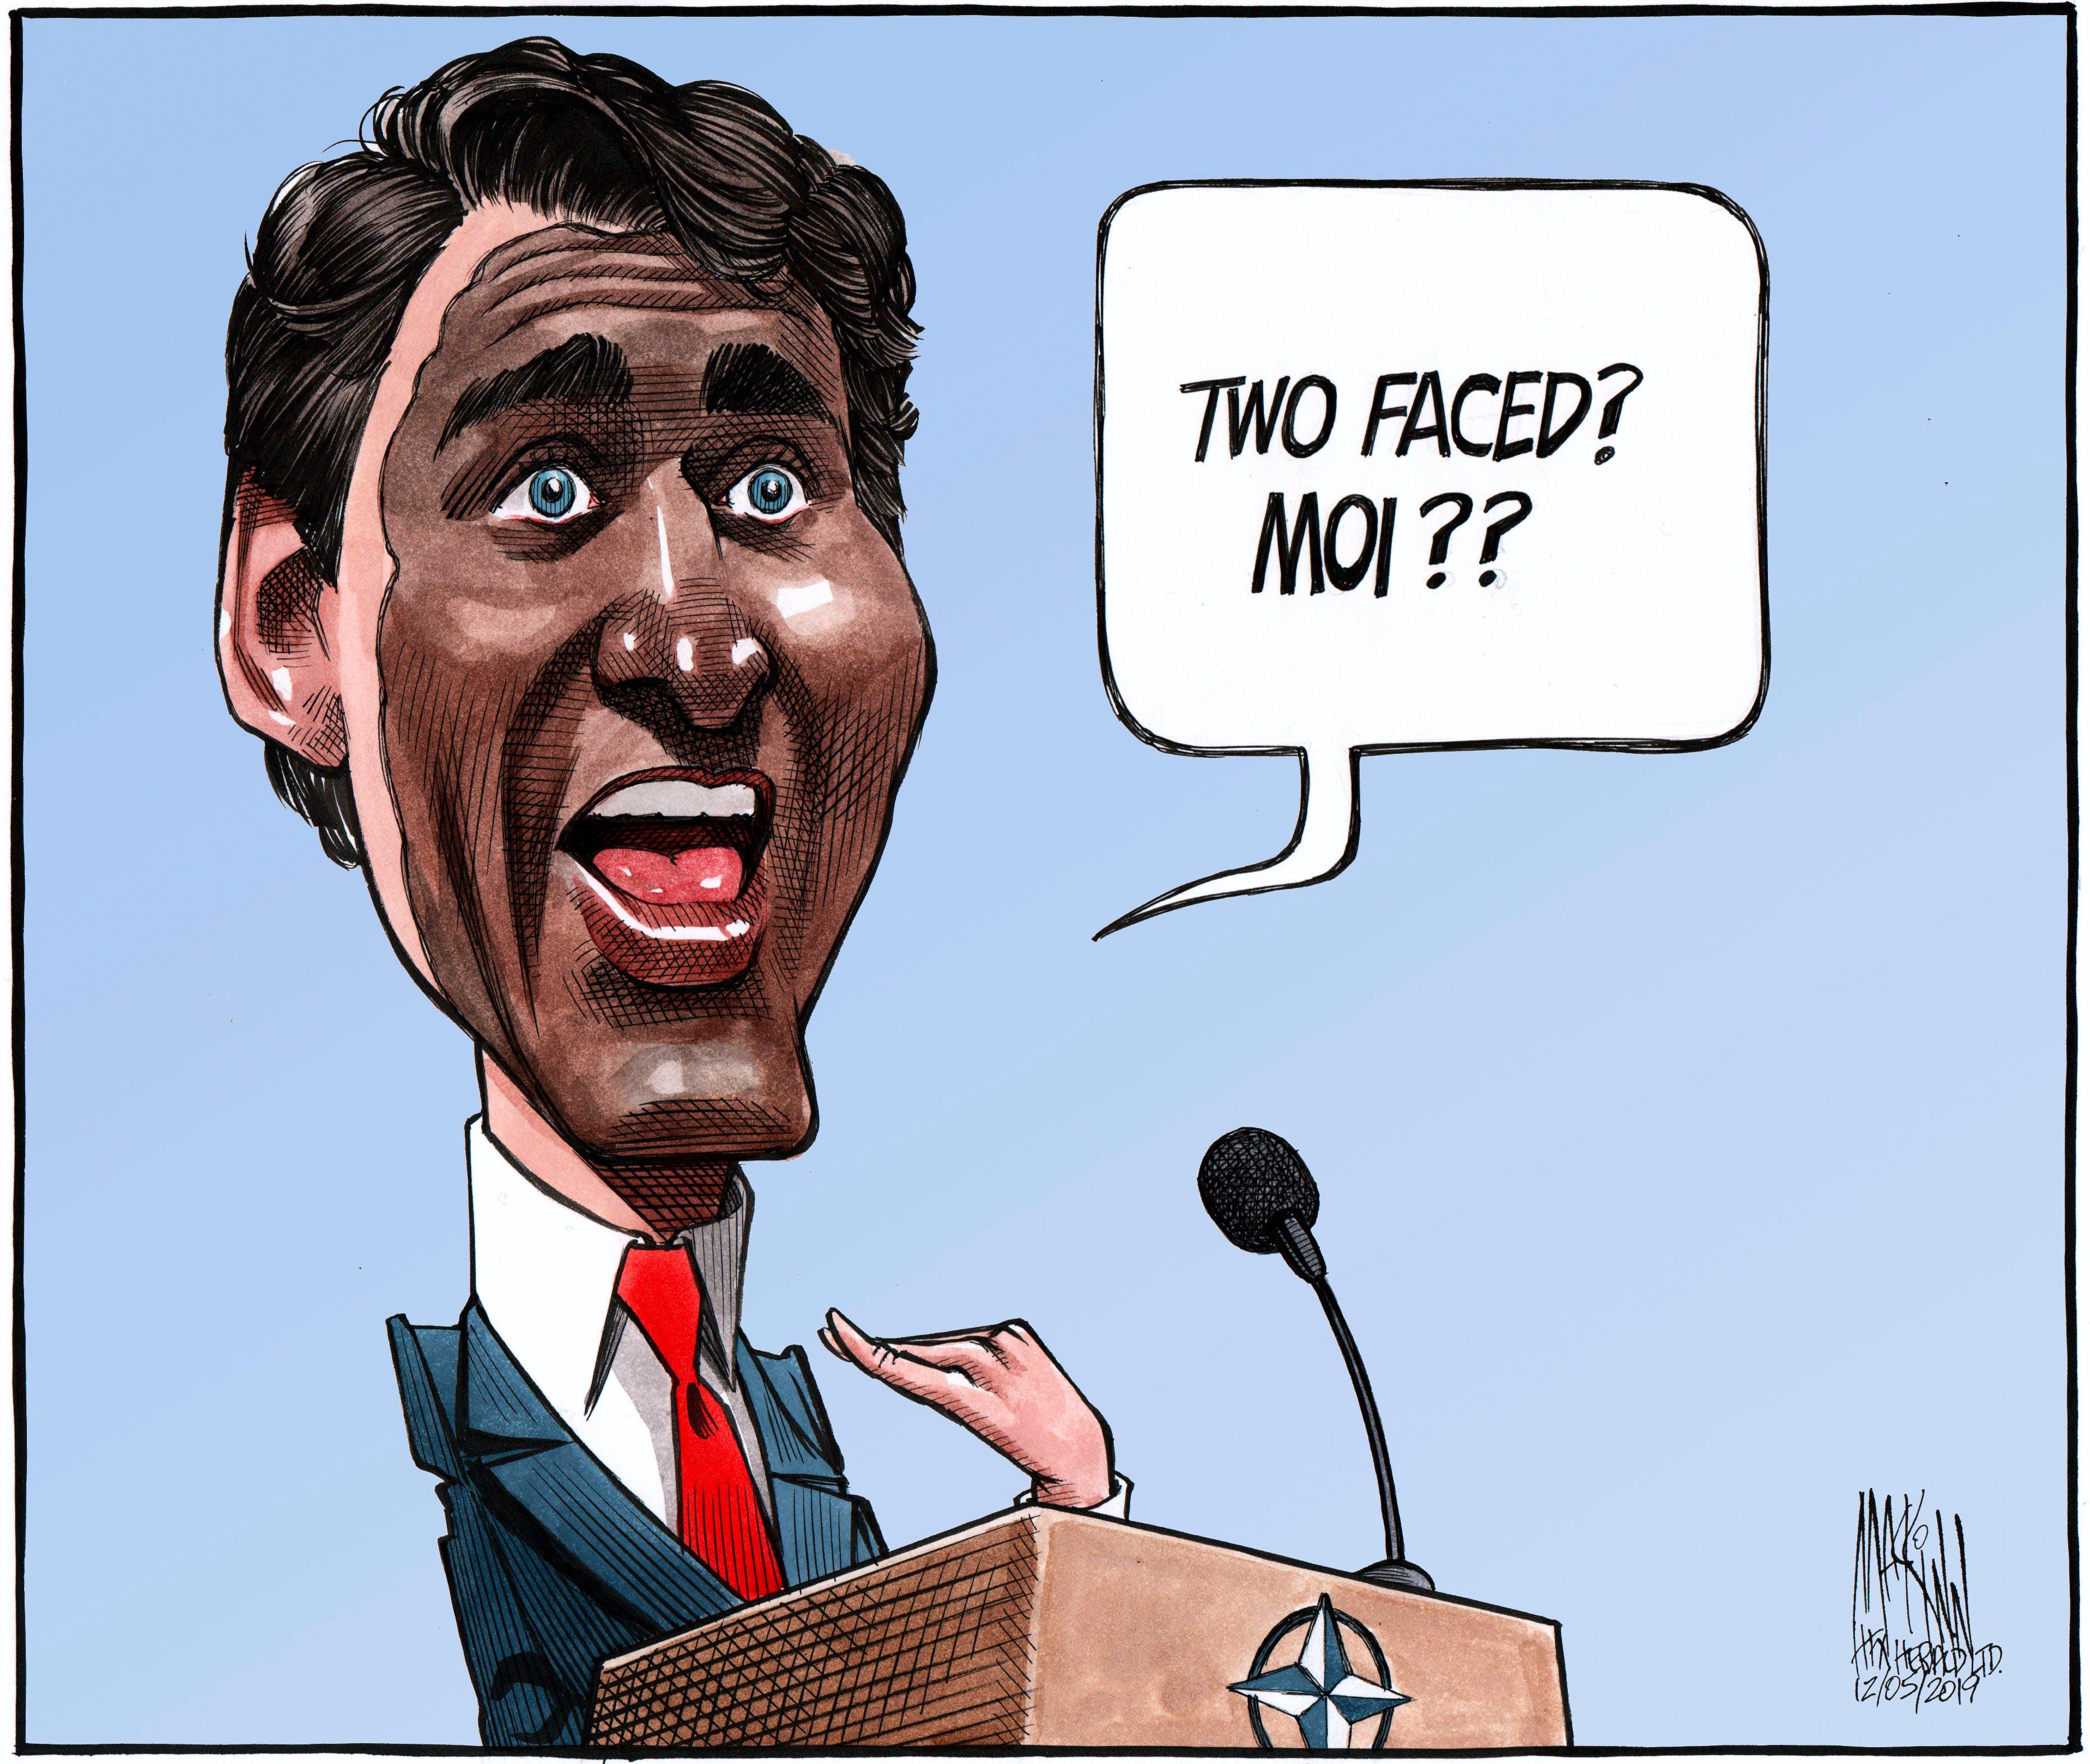 Bruce MacKinnon's editorial cartoon for Dec. 5, 2019. Prime Minister Justin Trudeau, blackface, scandal, Donald Trump, G&, two-faced.